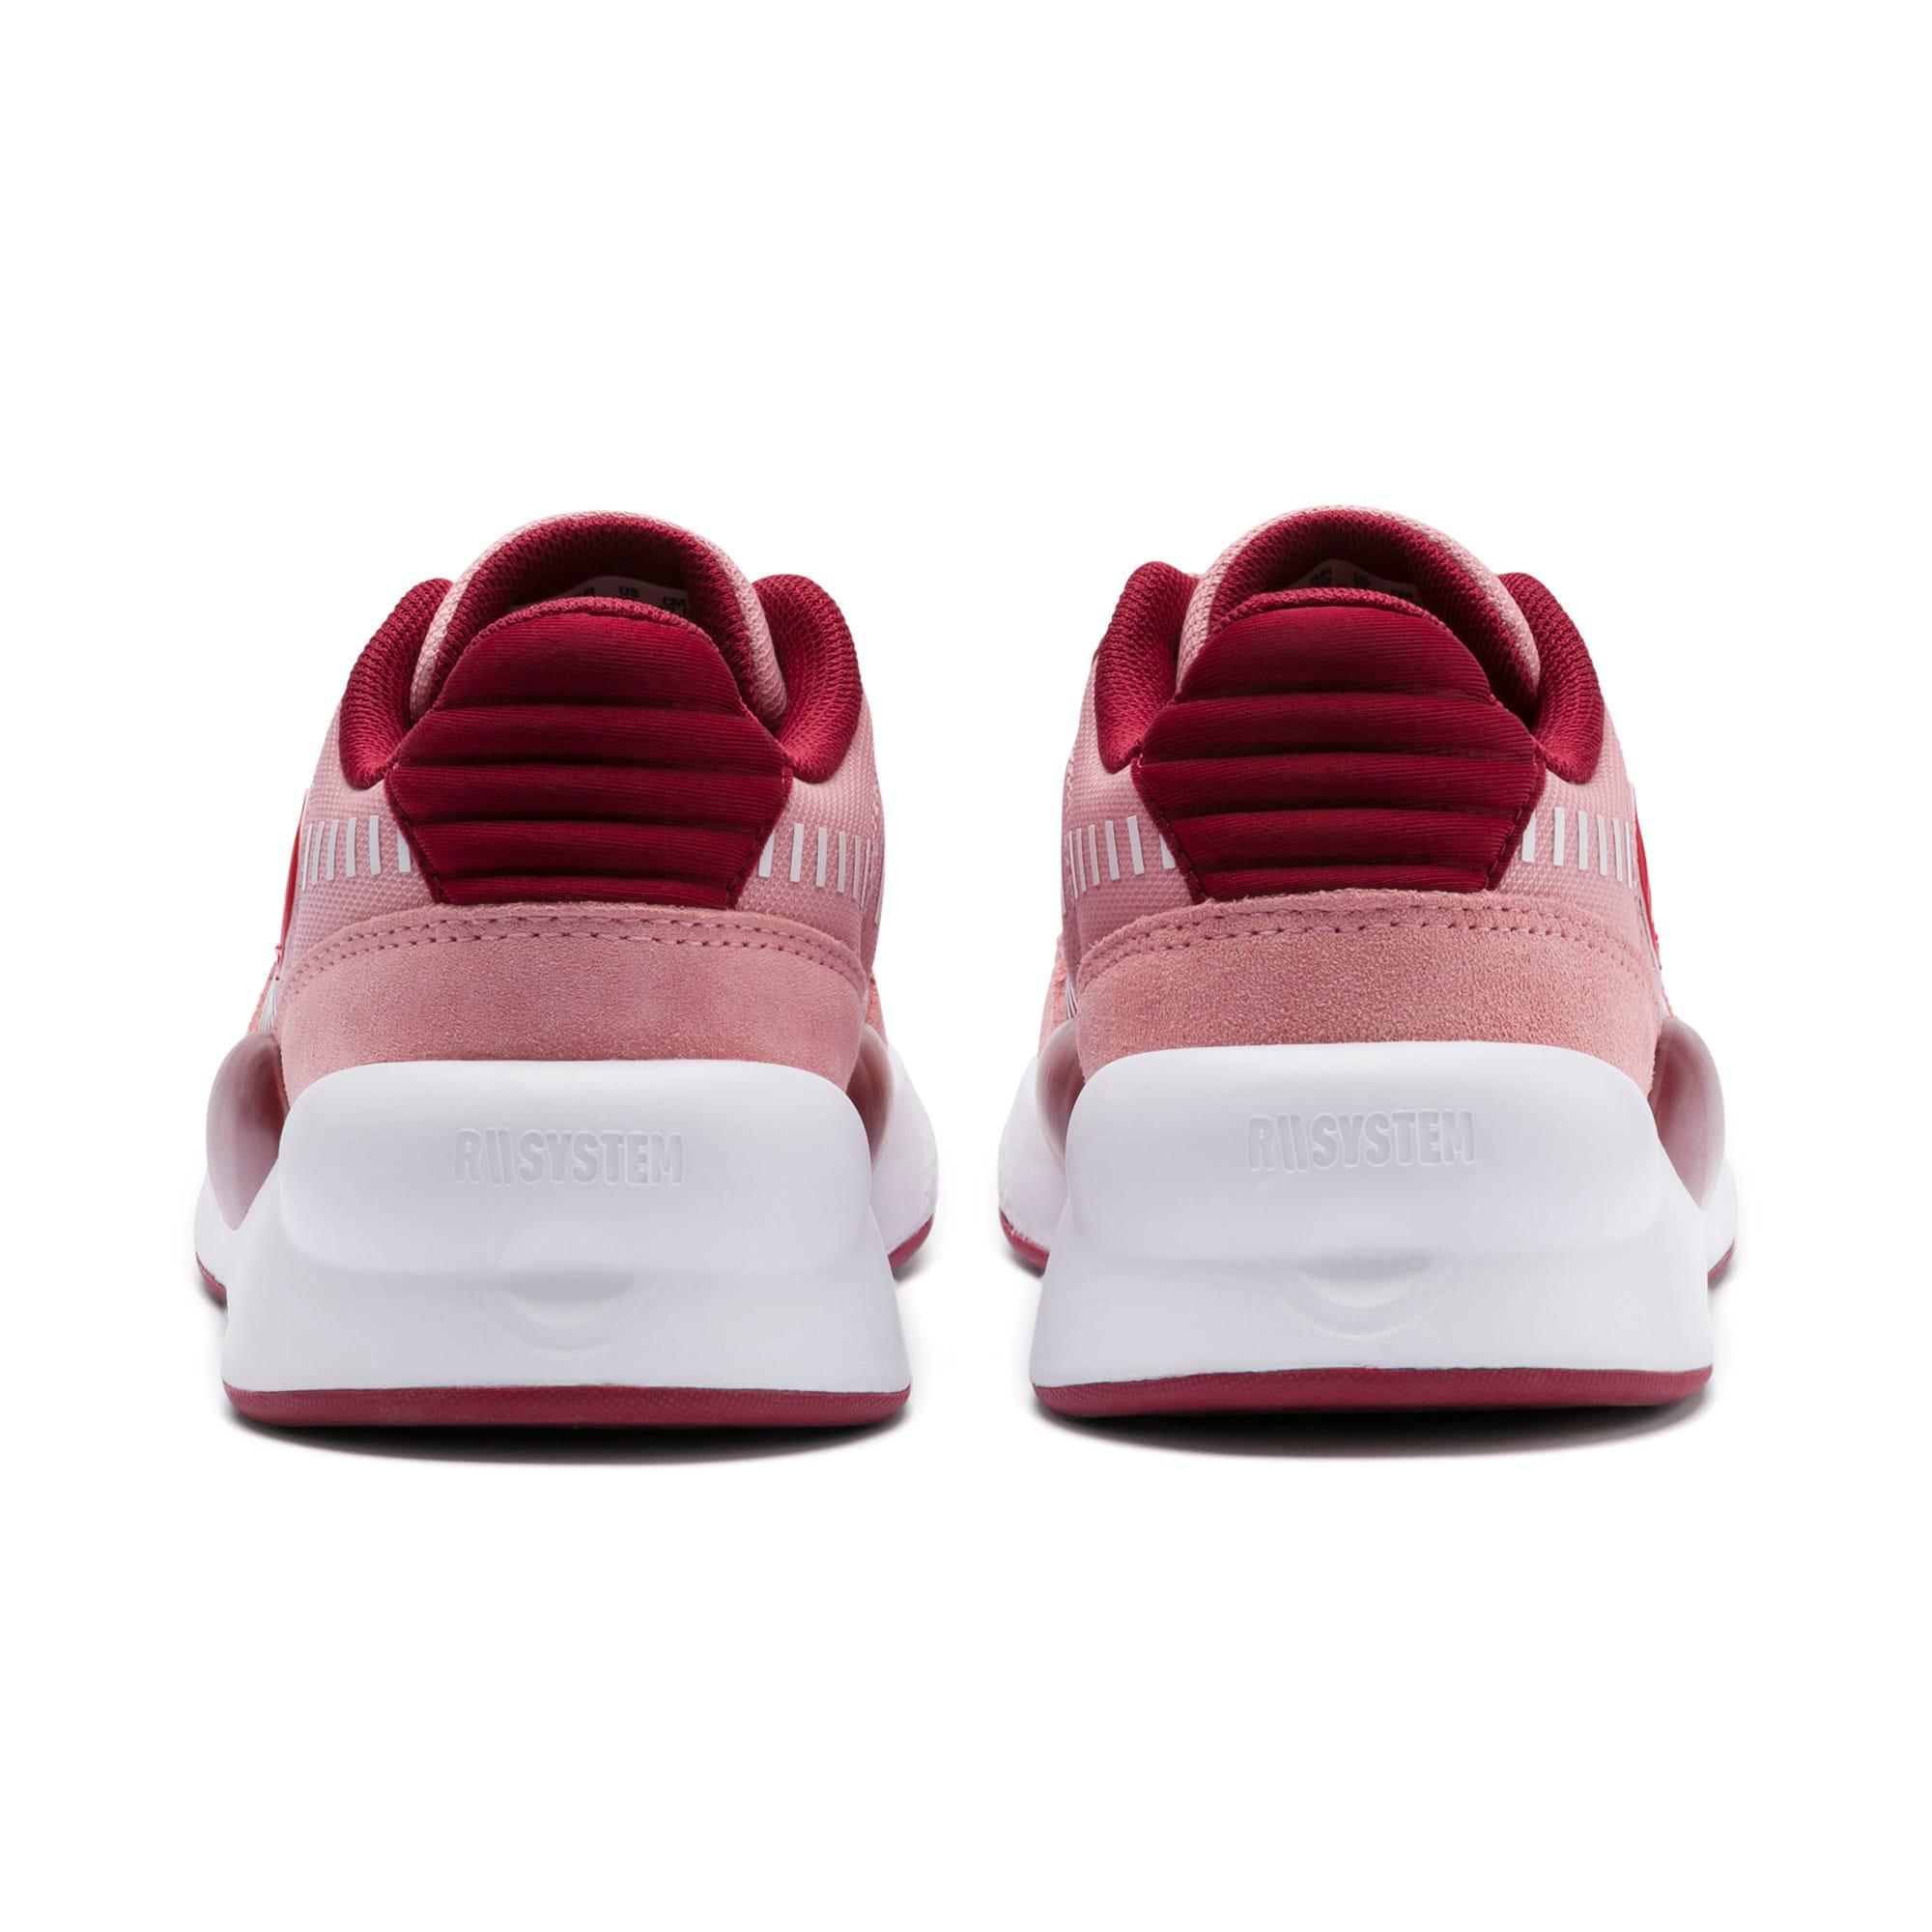 Thumbnail 3 of PUMA x SESAME STREET 50 RS 9.8 Little Kids' Shoes, Bridal Rose-Rhubarb, medium